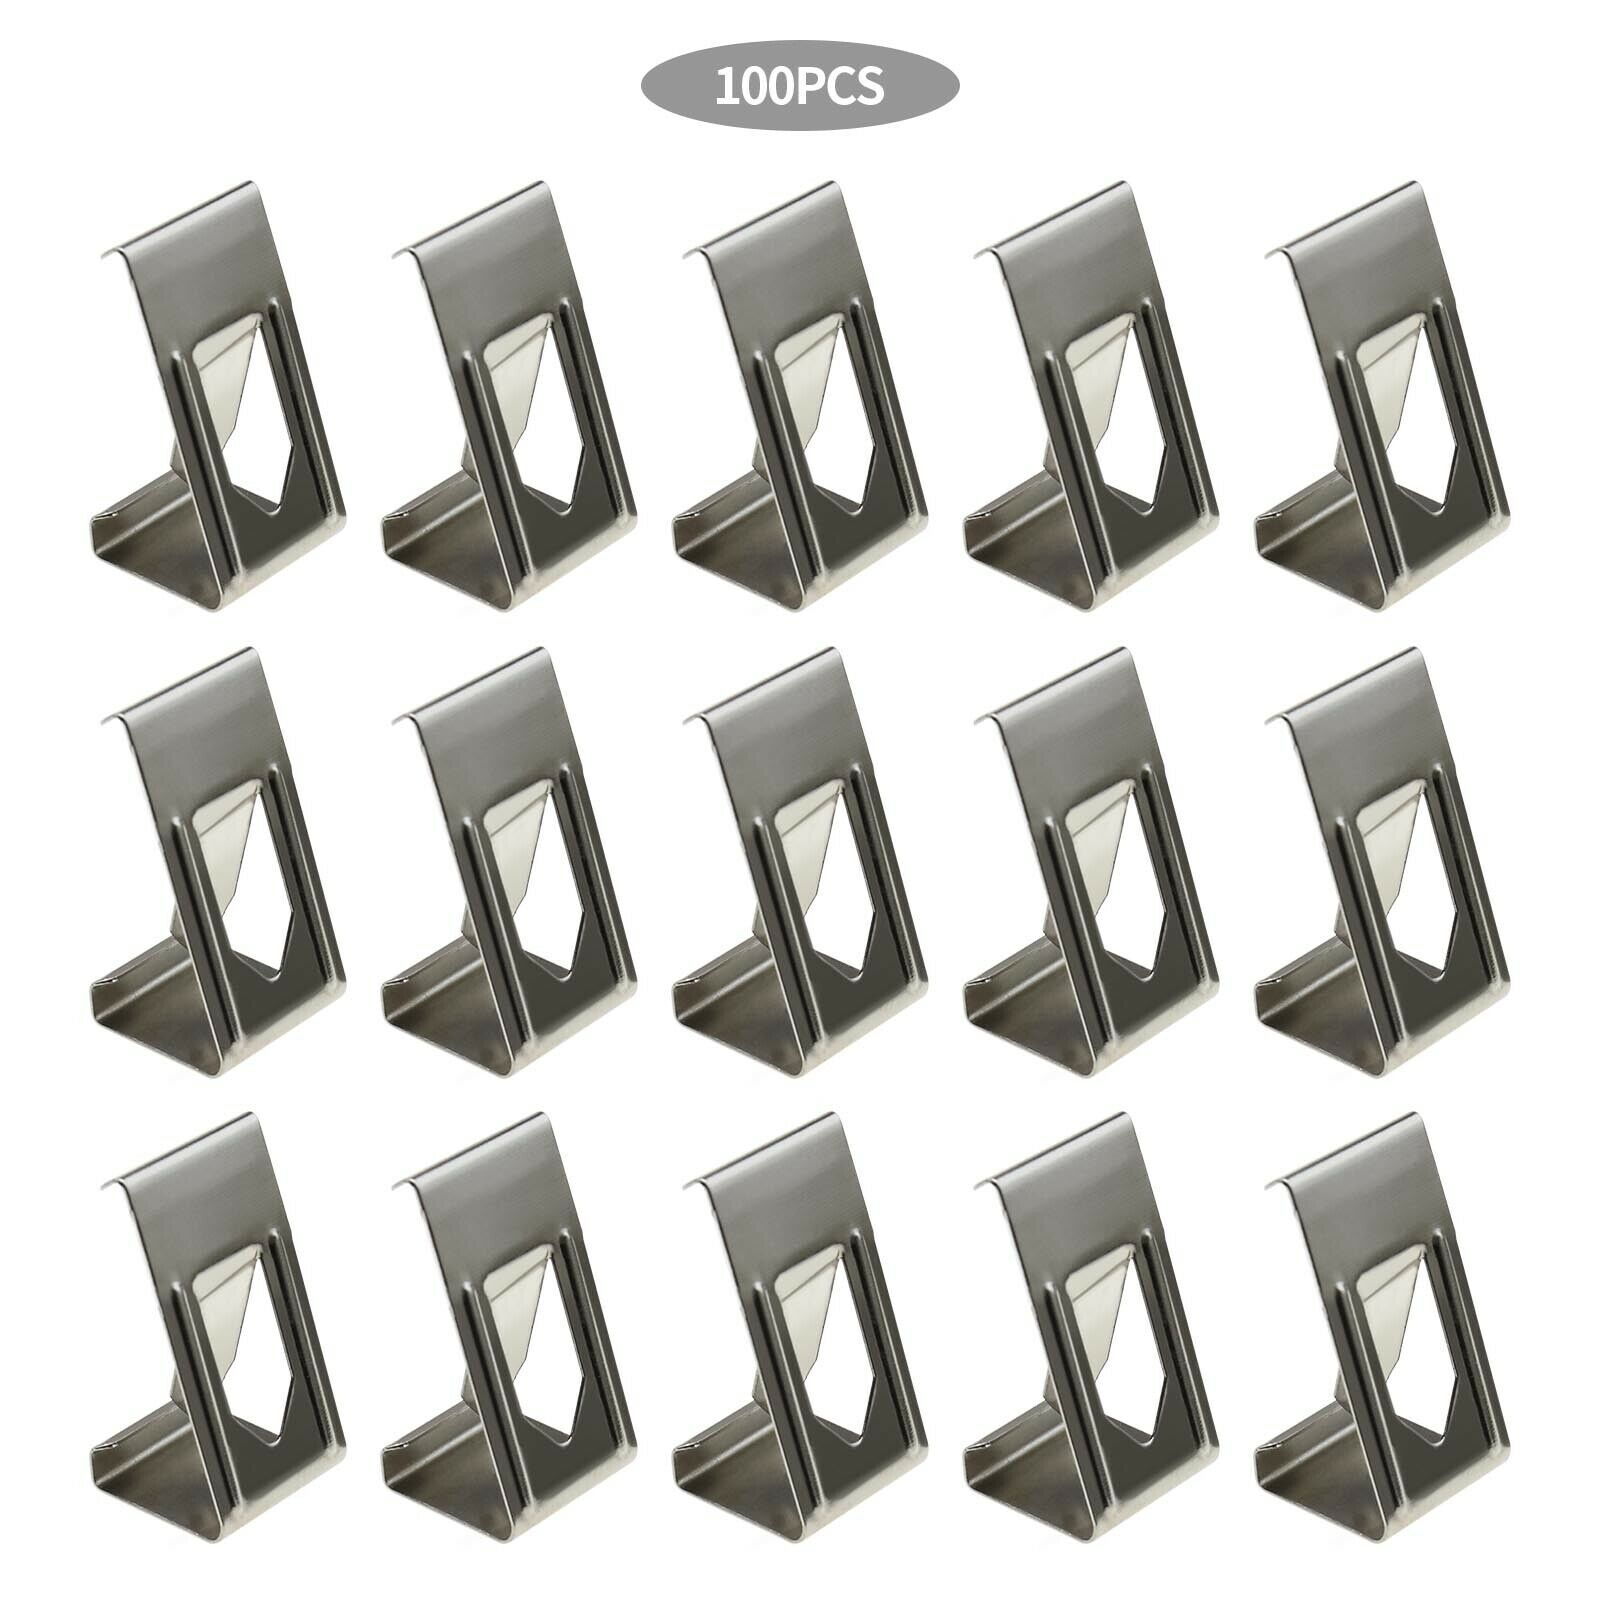 Silver Metal Spring Turn Clip Hanger For Frame 3D Printer Heated Bed 100Pcs